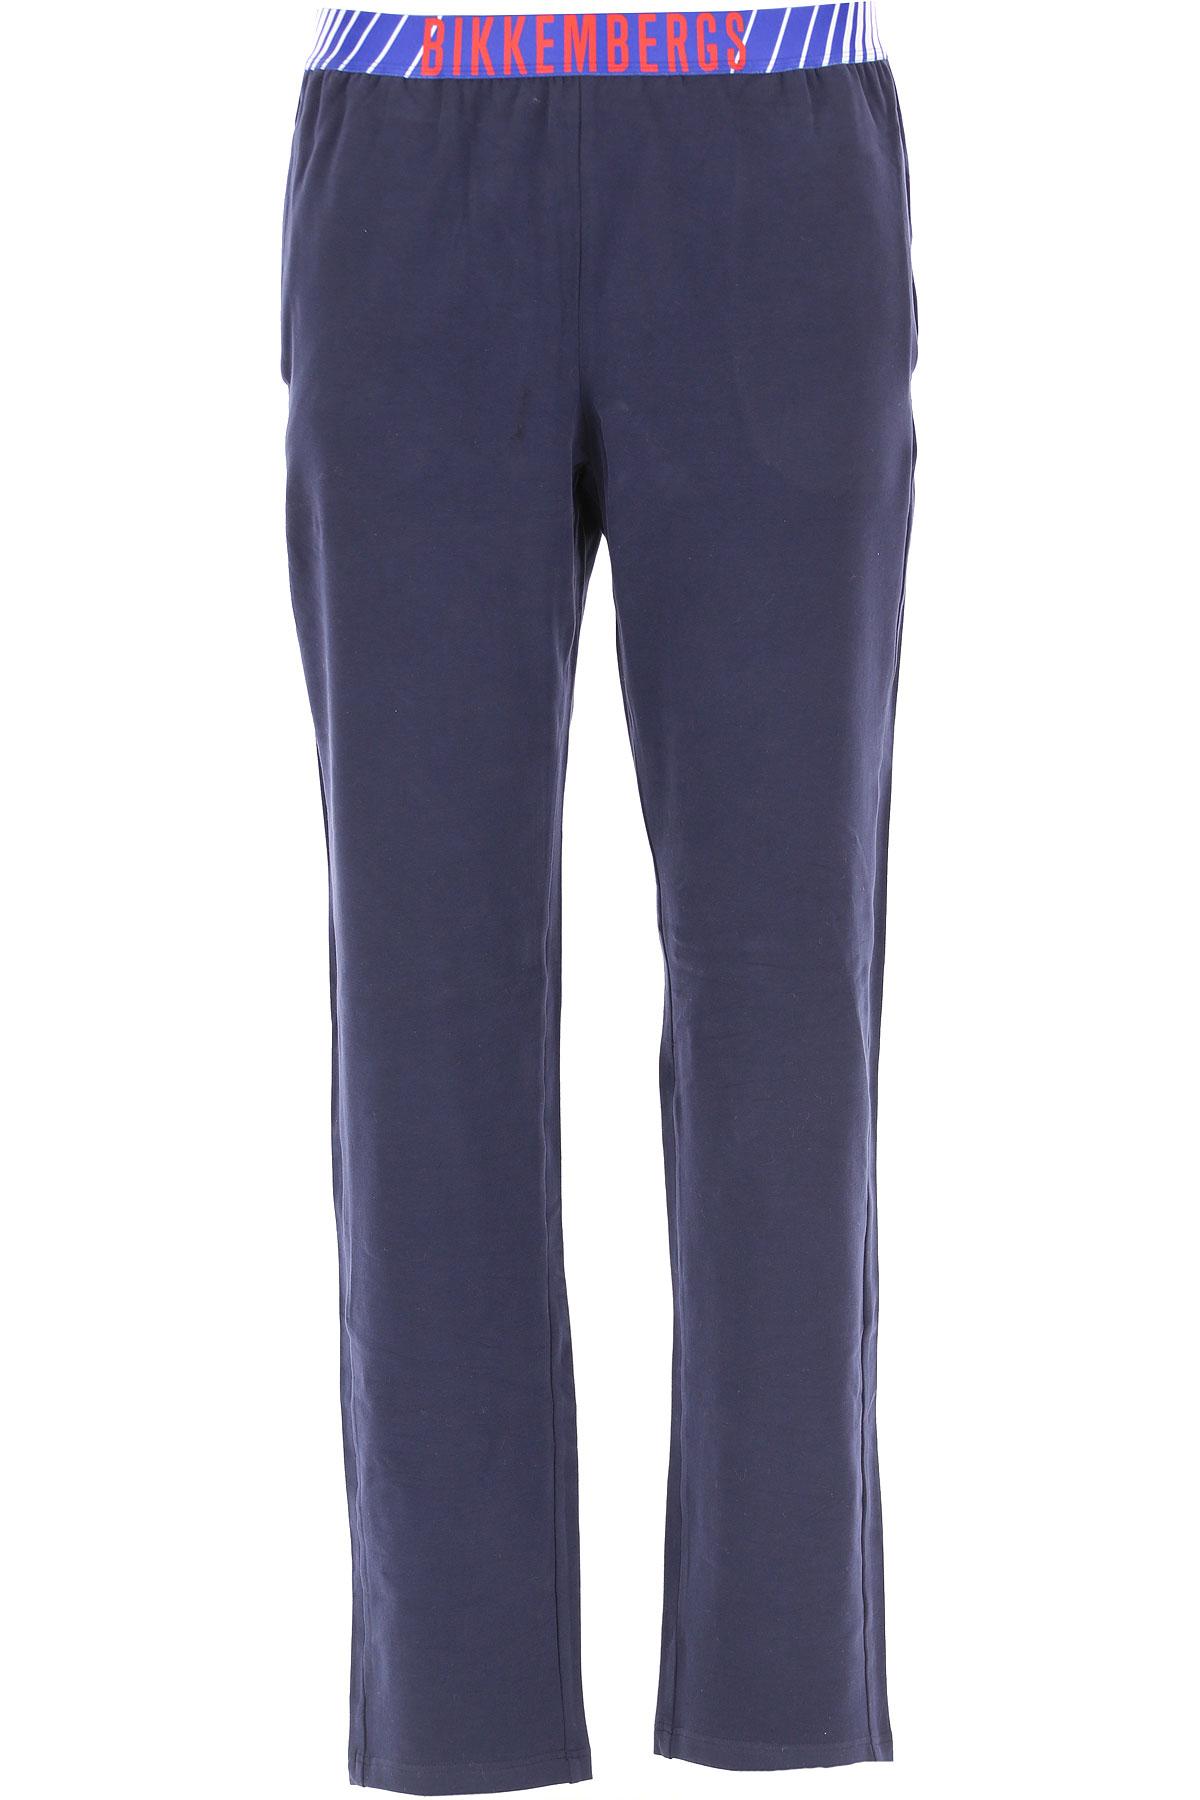 Dirk Bikkembergs Loungewear for Men On Sale, Blue, Cotton, 2019, S (EU 3) M (EU 4) L (EU 5)